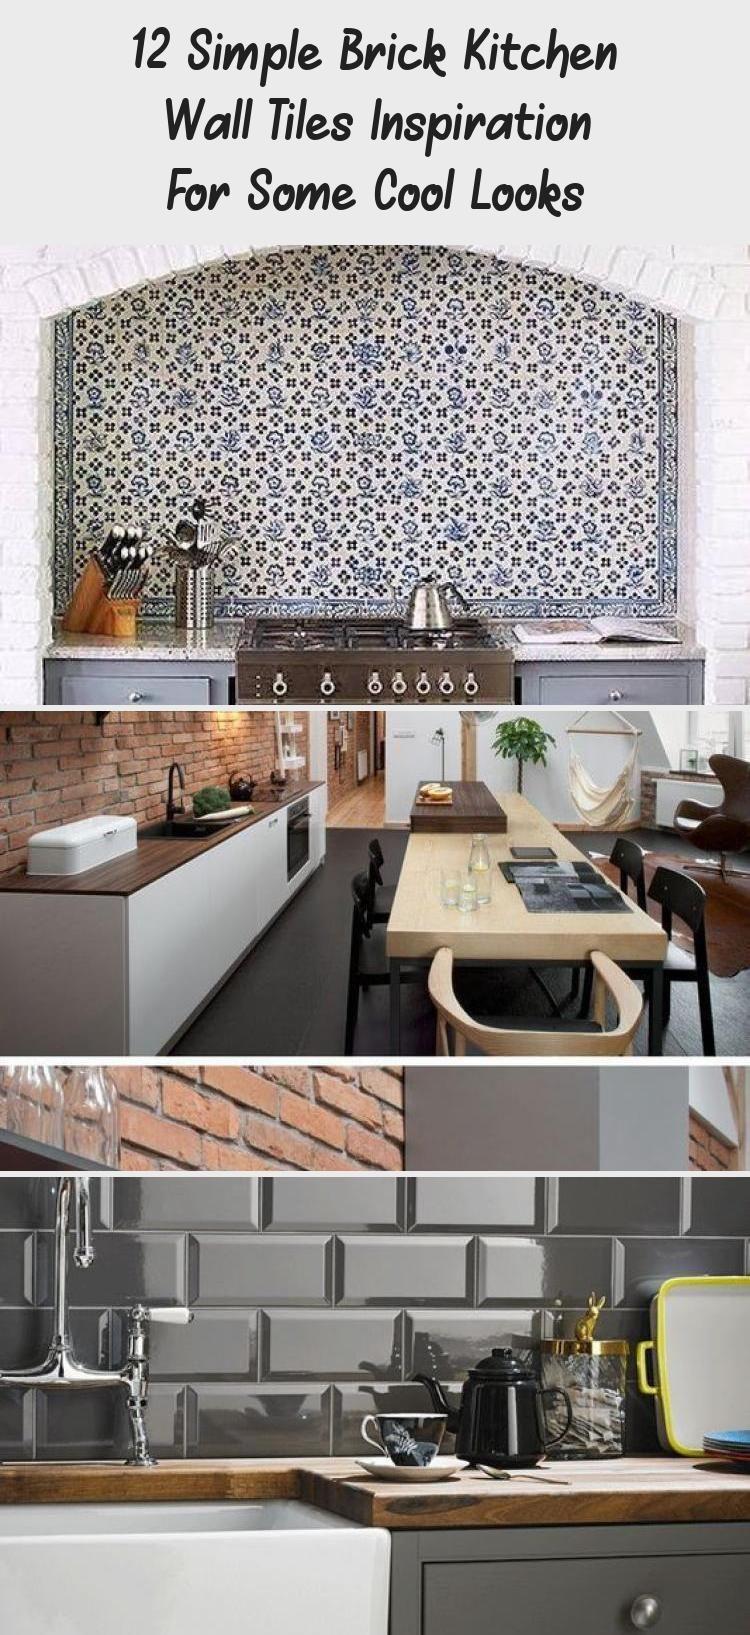 12 Simple Brick Kitchen Wall Tiles Inspiration For Some Cool Looks Kitchen In 2020 Brick Kitchen Kitchen Wall Tiles Kitchen Wall